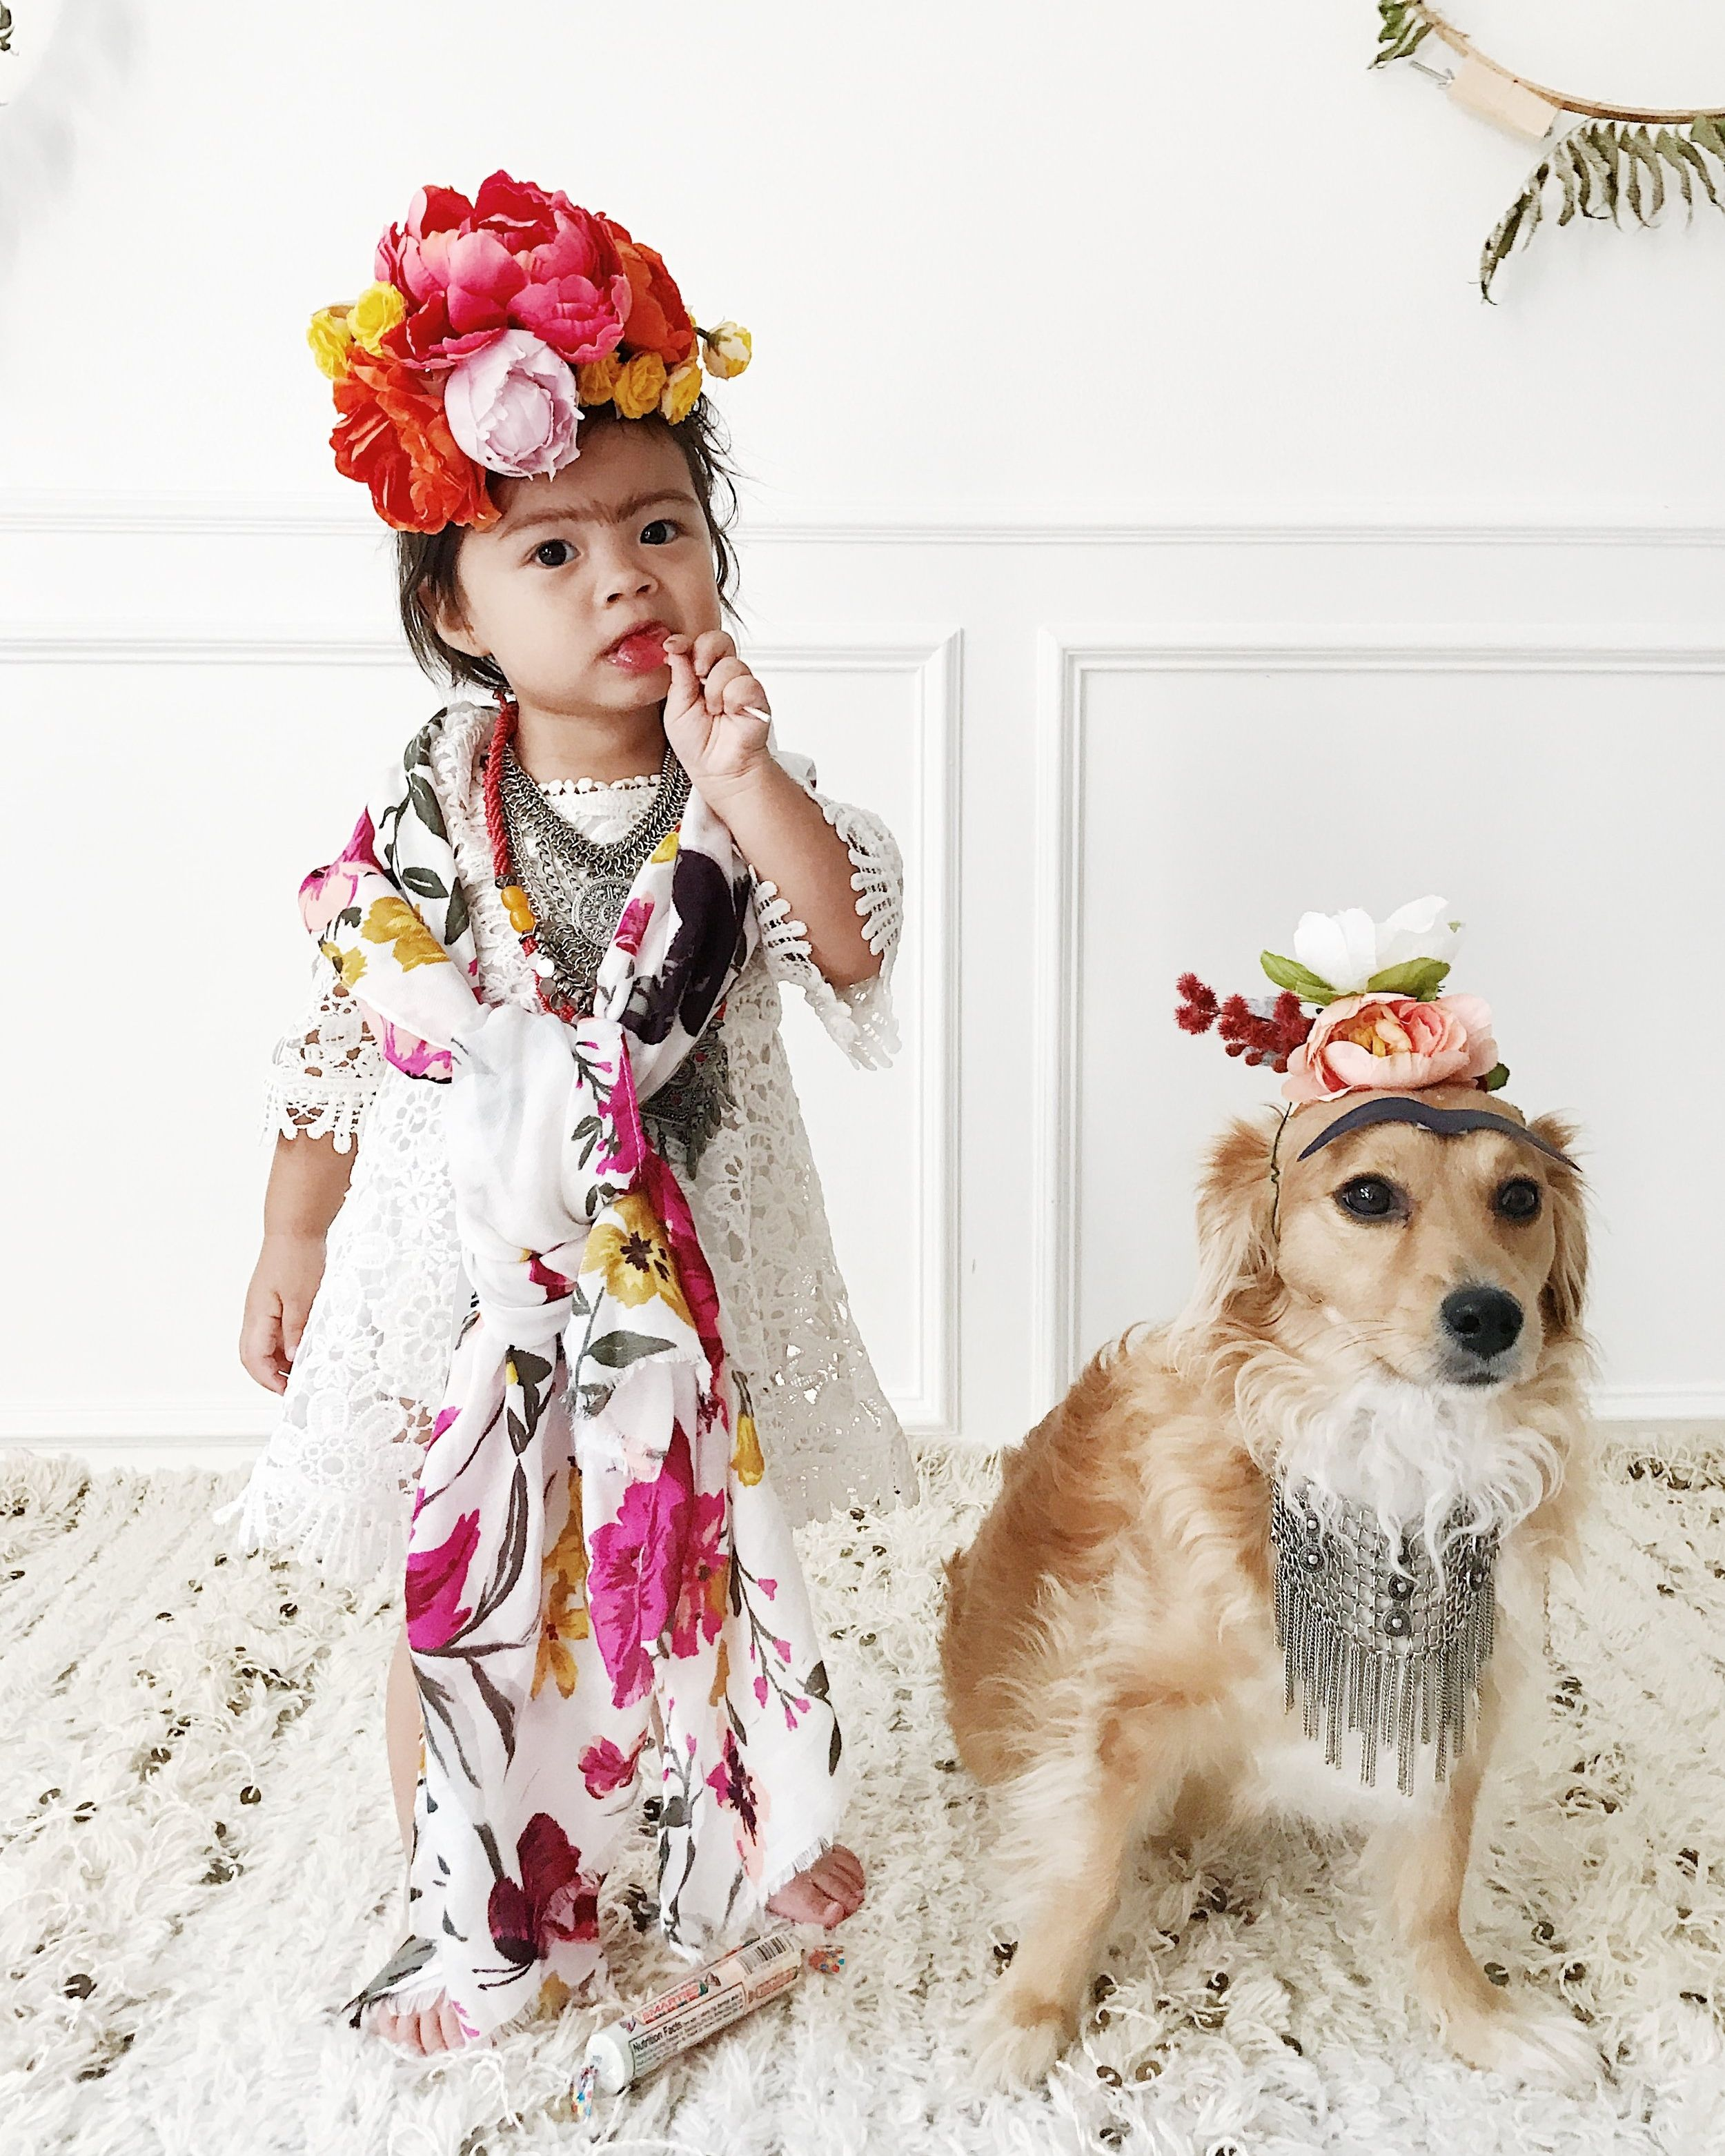 Diy Frida Kahlo Kids Costume Plus Diy Silk Flower Crown With